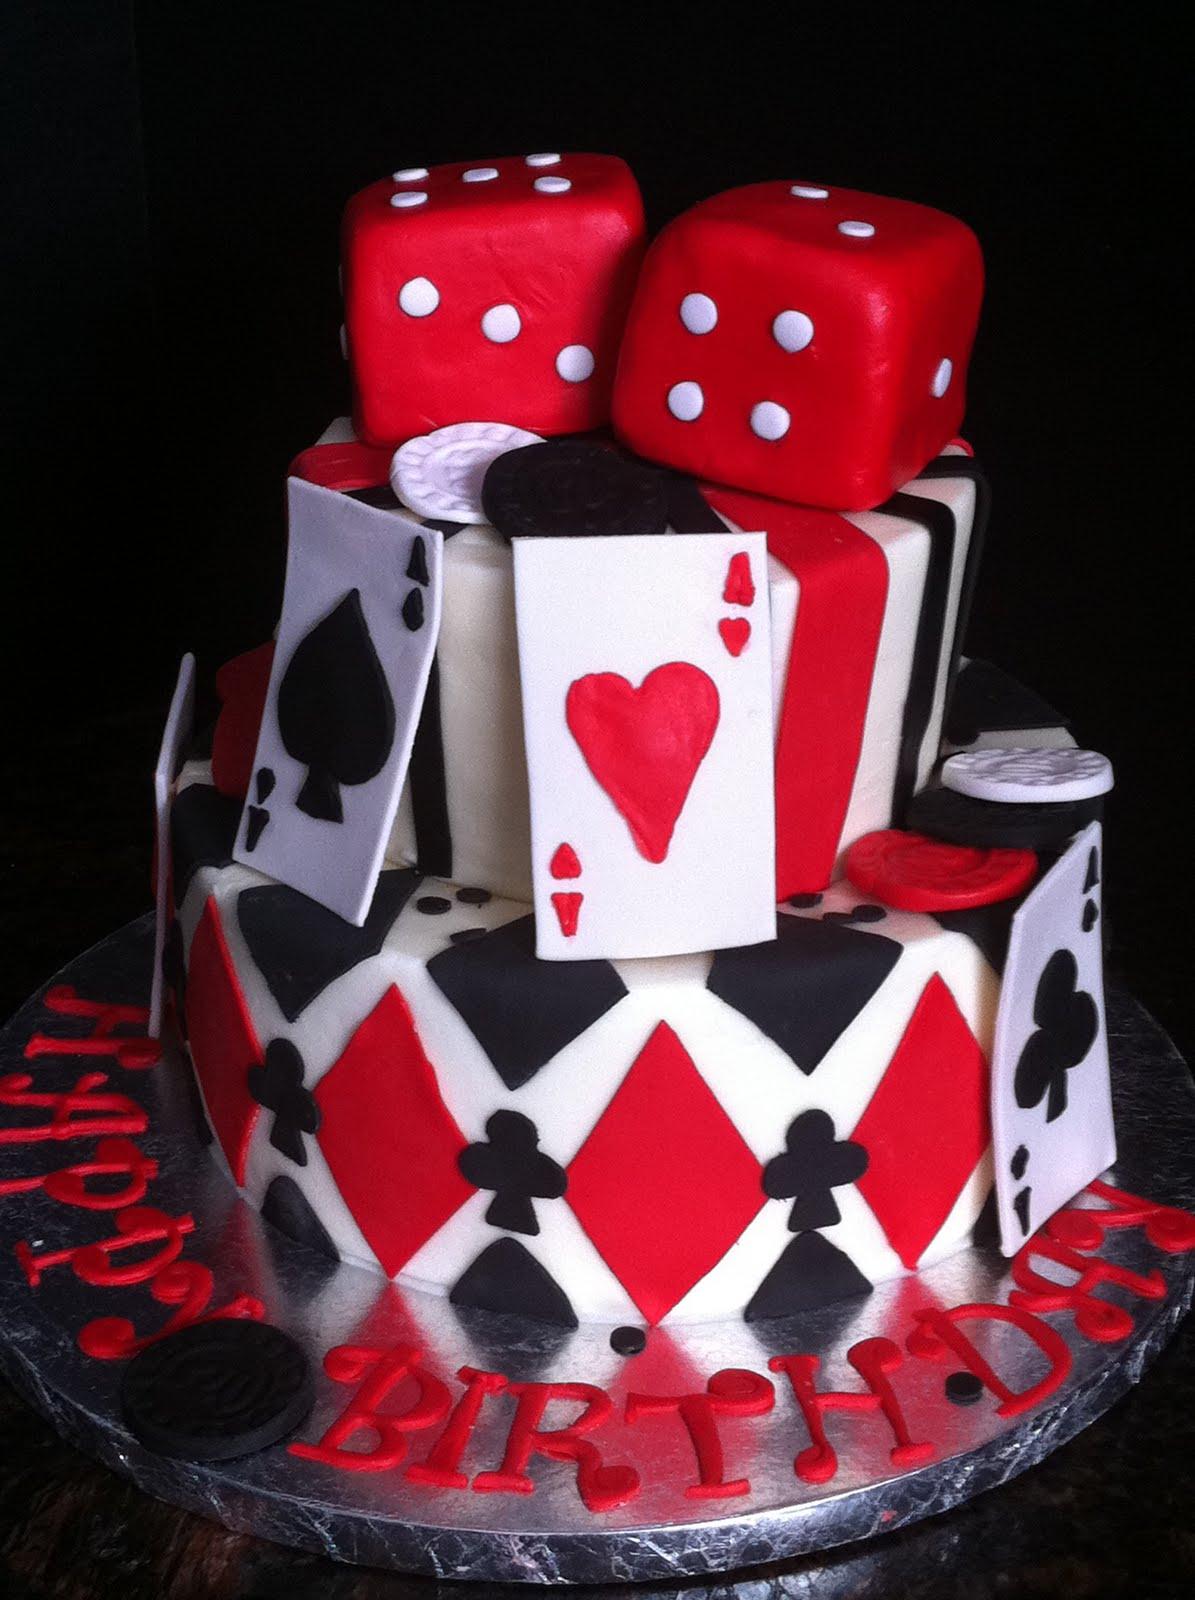 Casino cake ameristar casino free